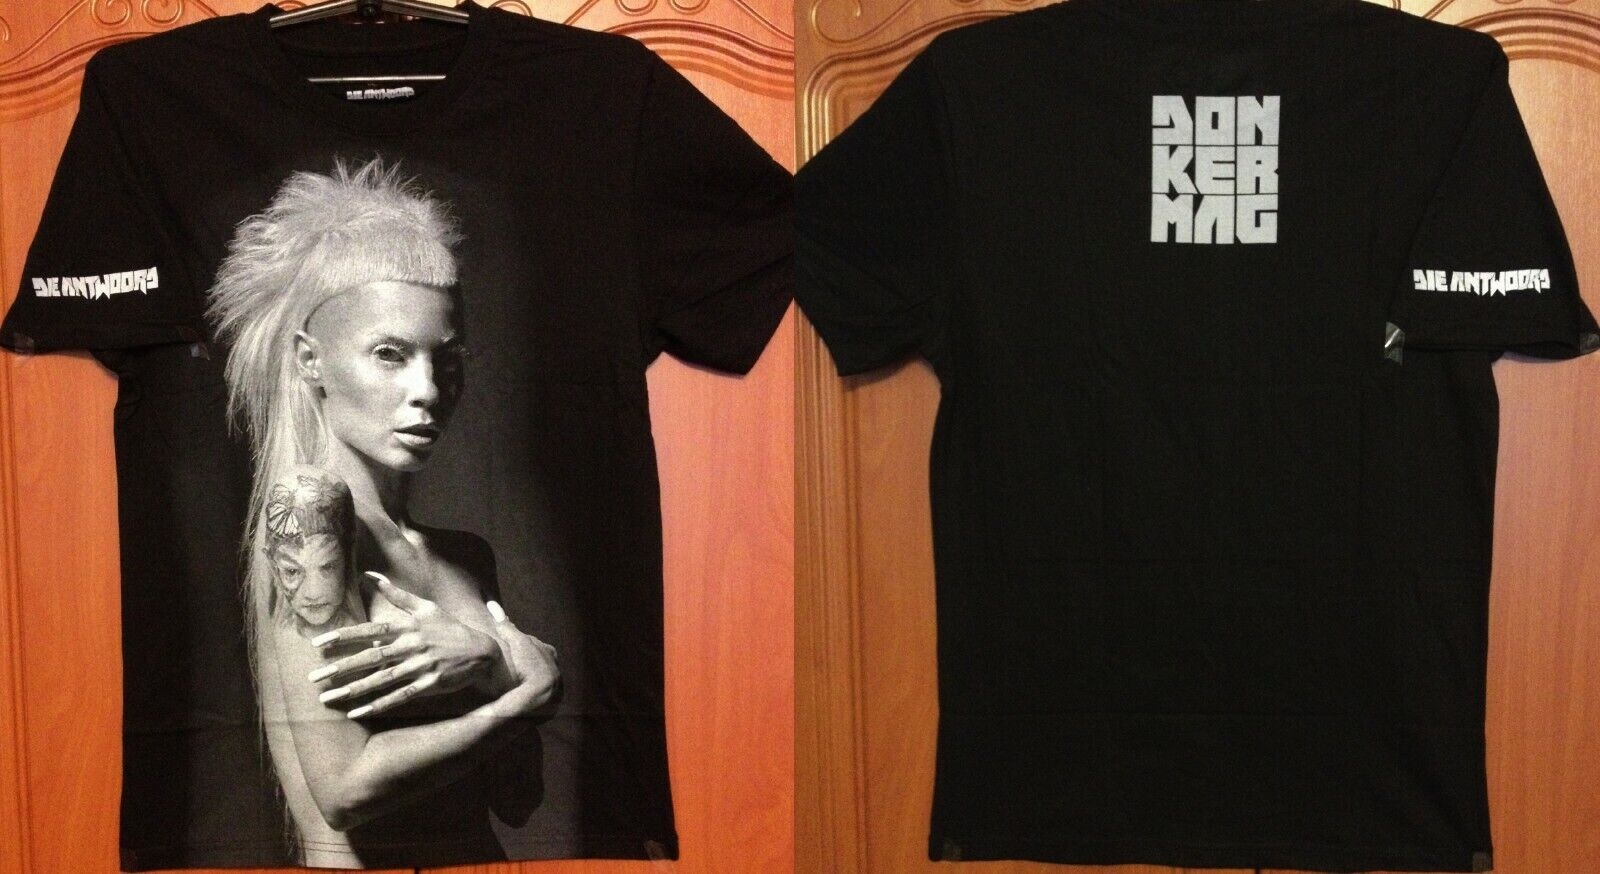 DIE ANTWOORD Donker Mag Yolandi Visser RARE Authentic Official Licensed T-Shirt